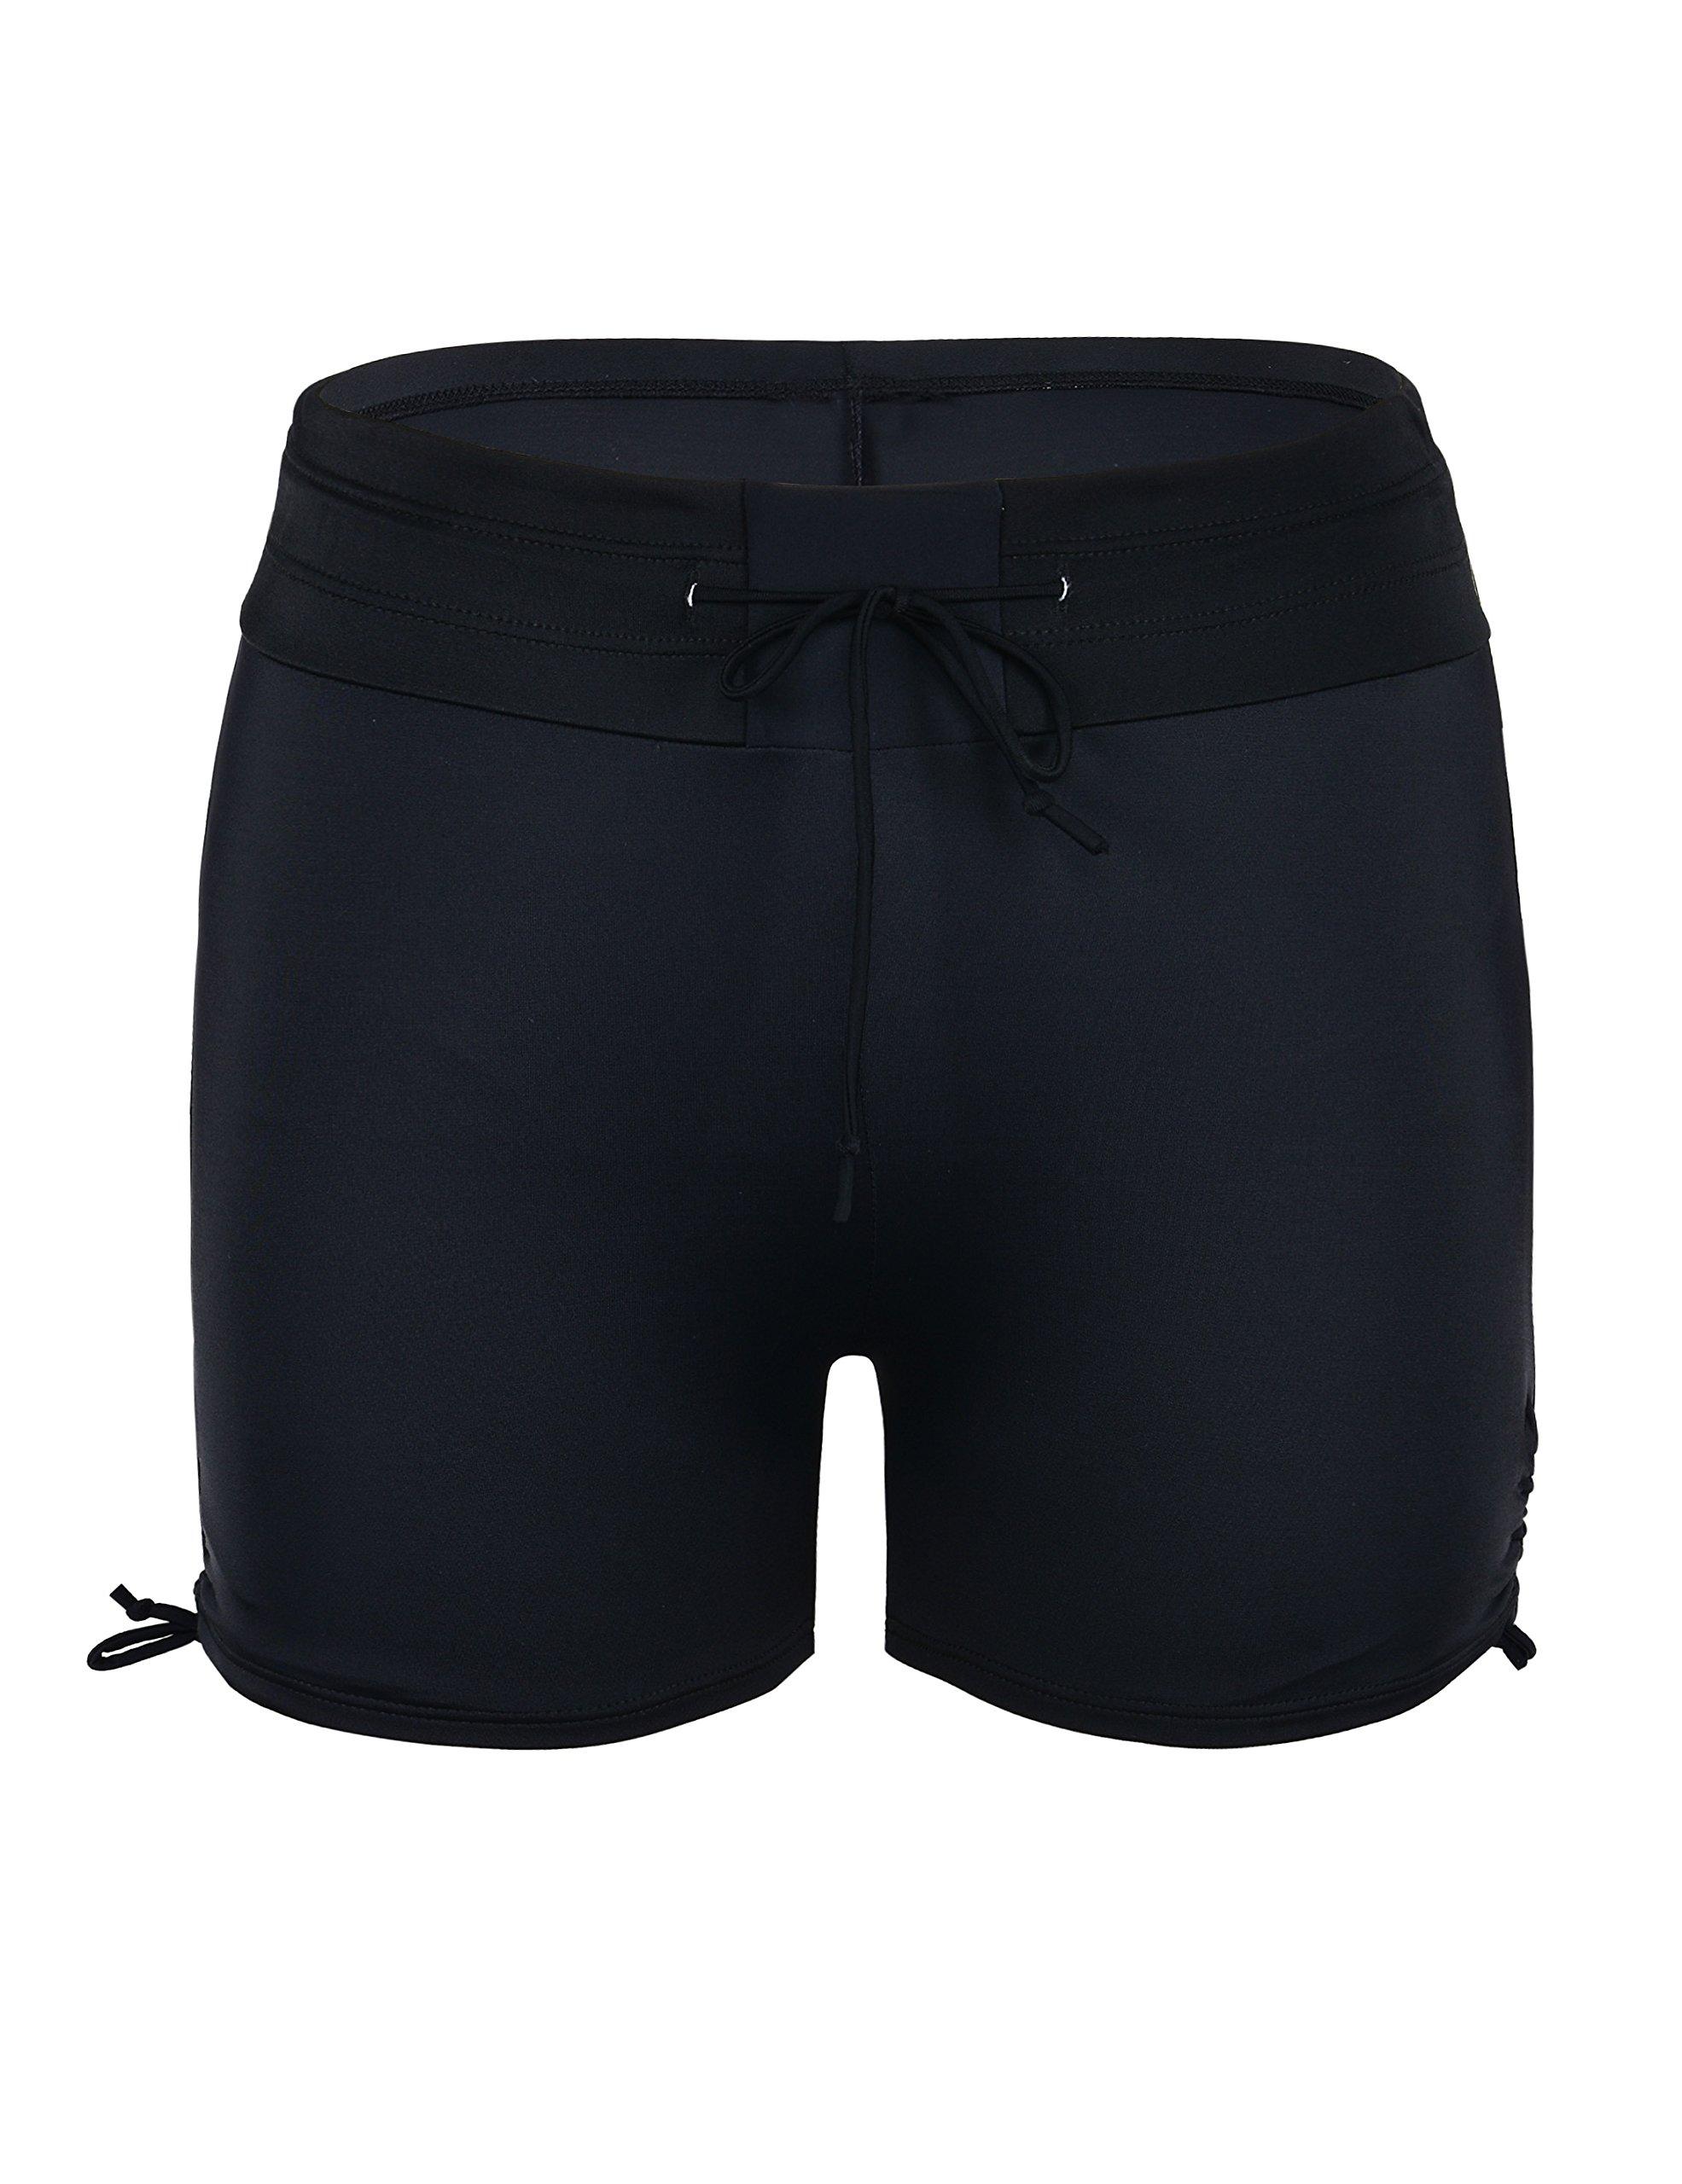 Septangle Womens Black Swim Sports Board Shorts Bottom with Side Ties,US 14